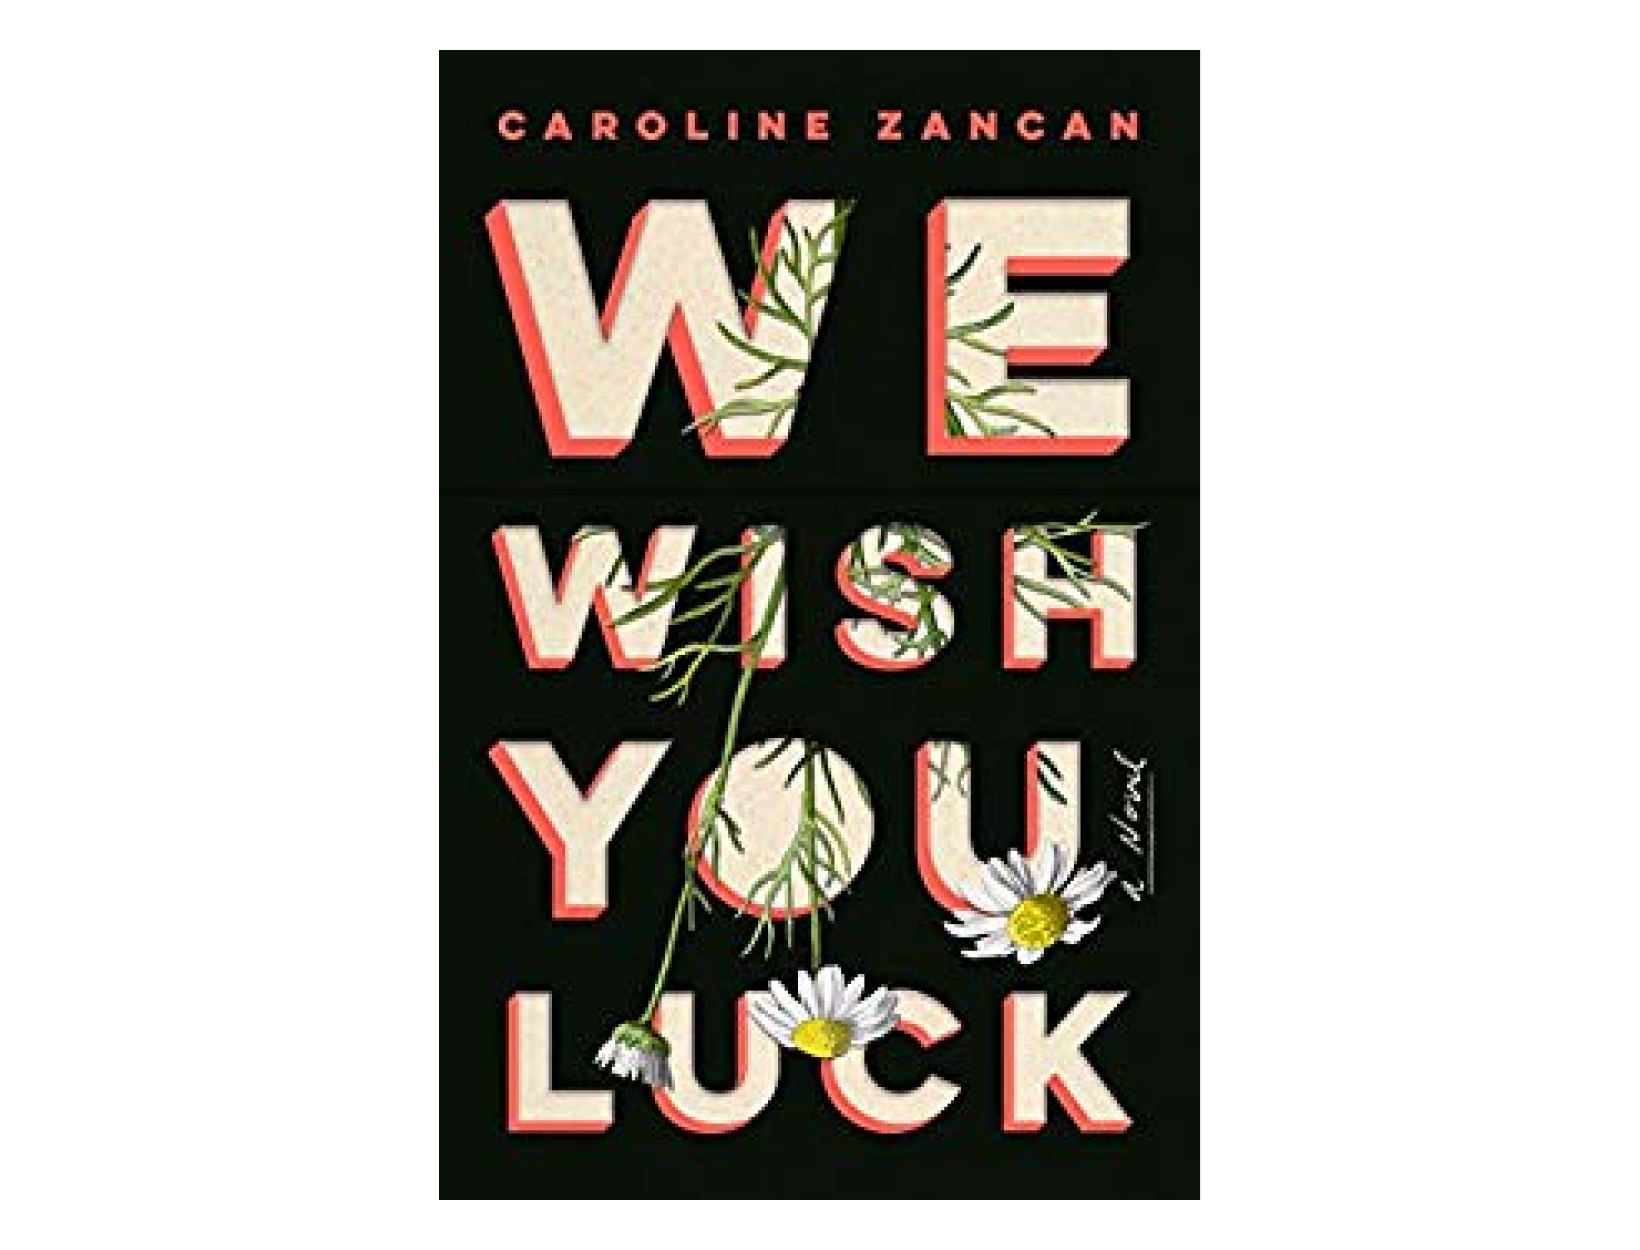 <em>We Wish You Luck</em> by CarolineZancan